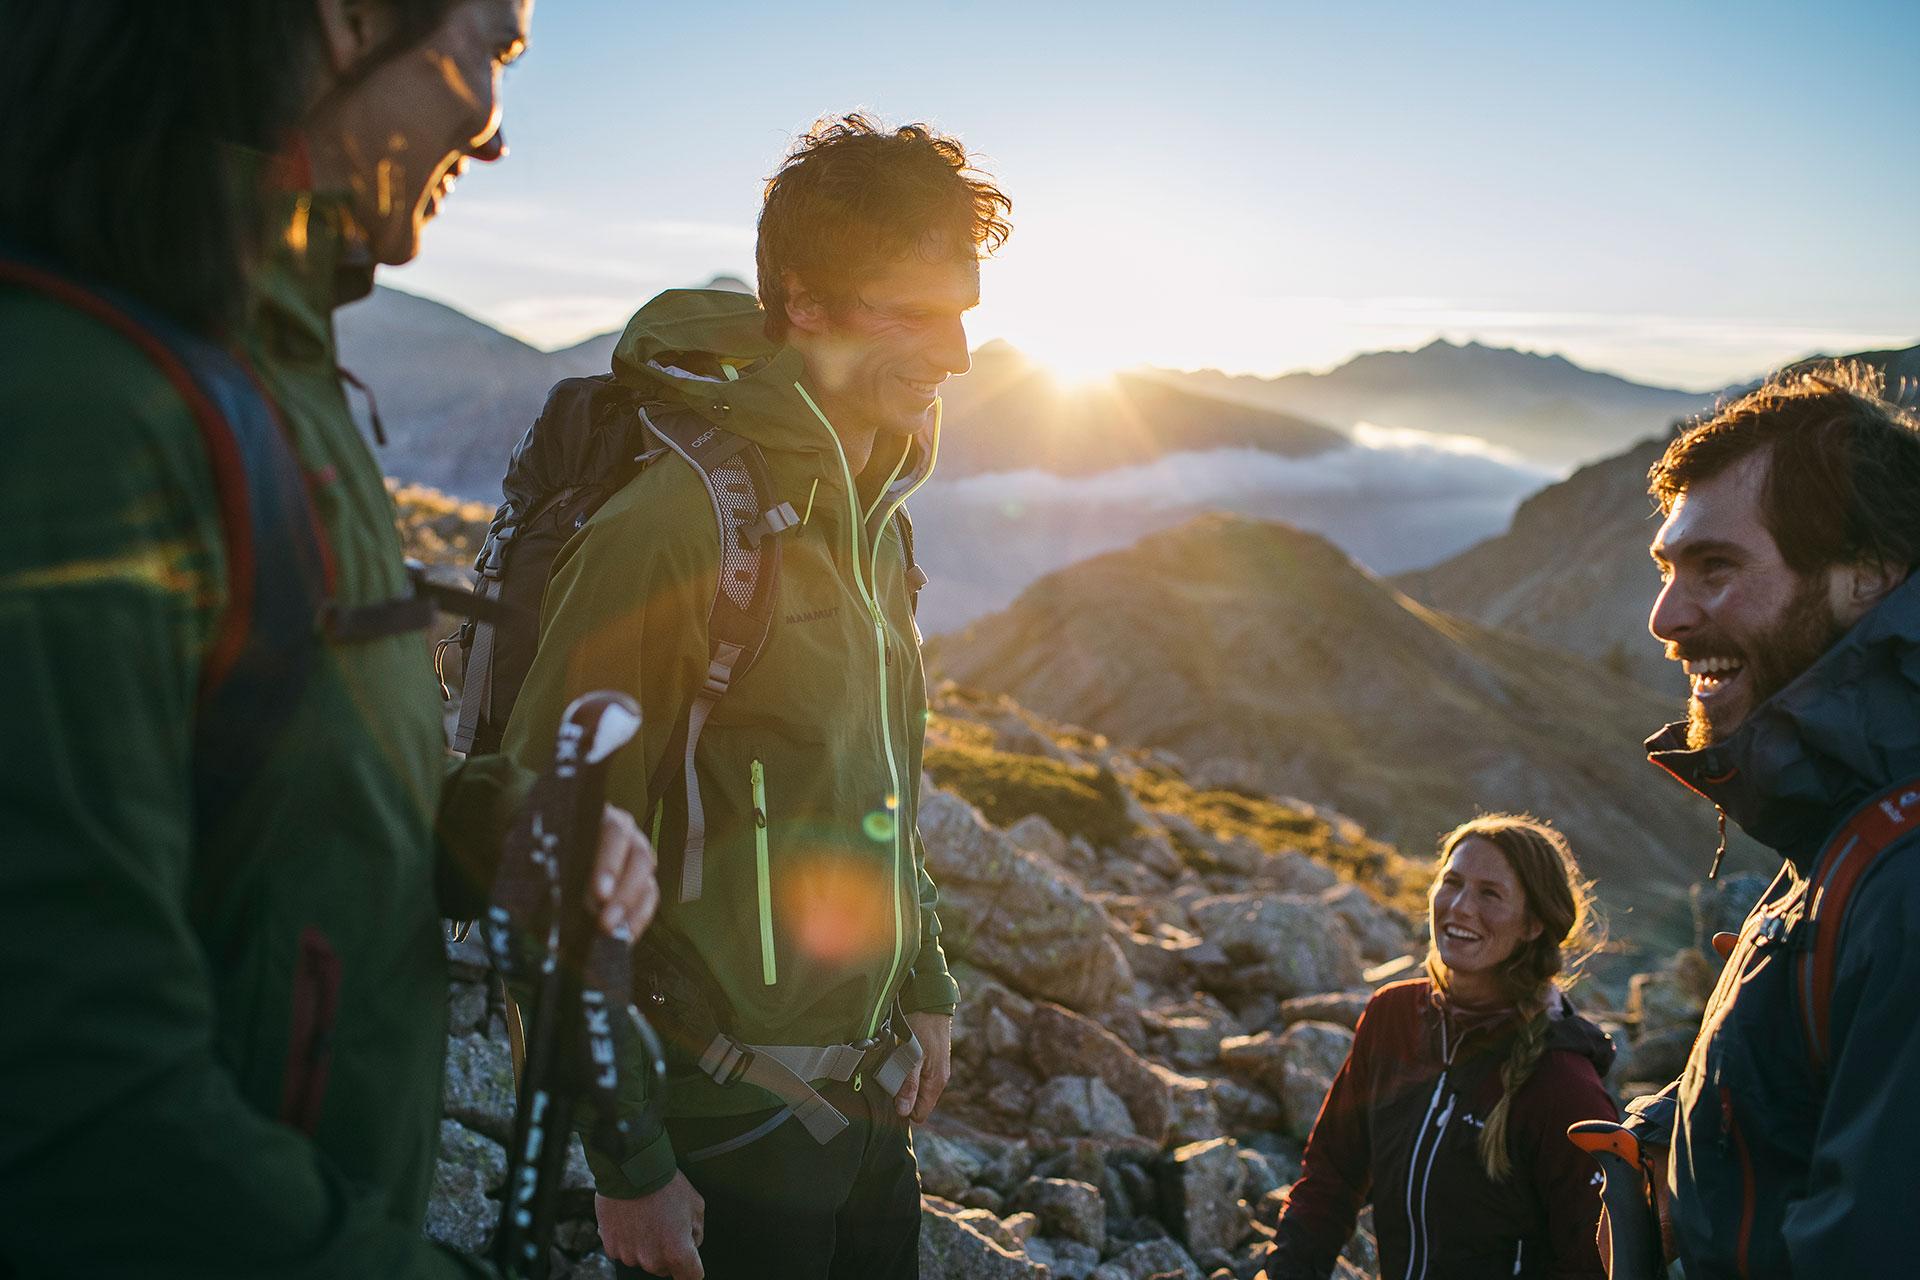 Katalog Fotoproduktion Nürnberg Deutschland Bergsport Trekking Wandern Outdoor